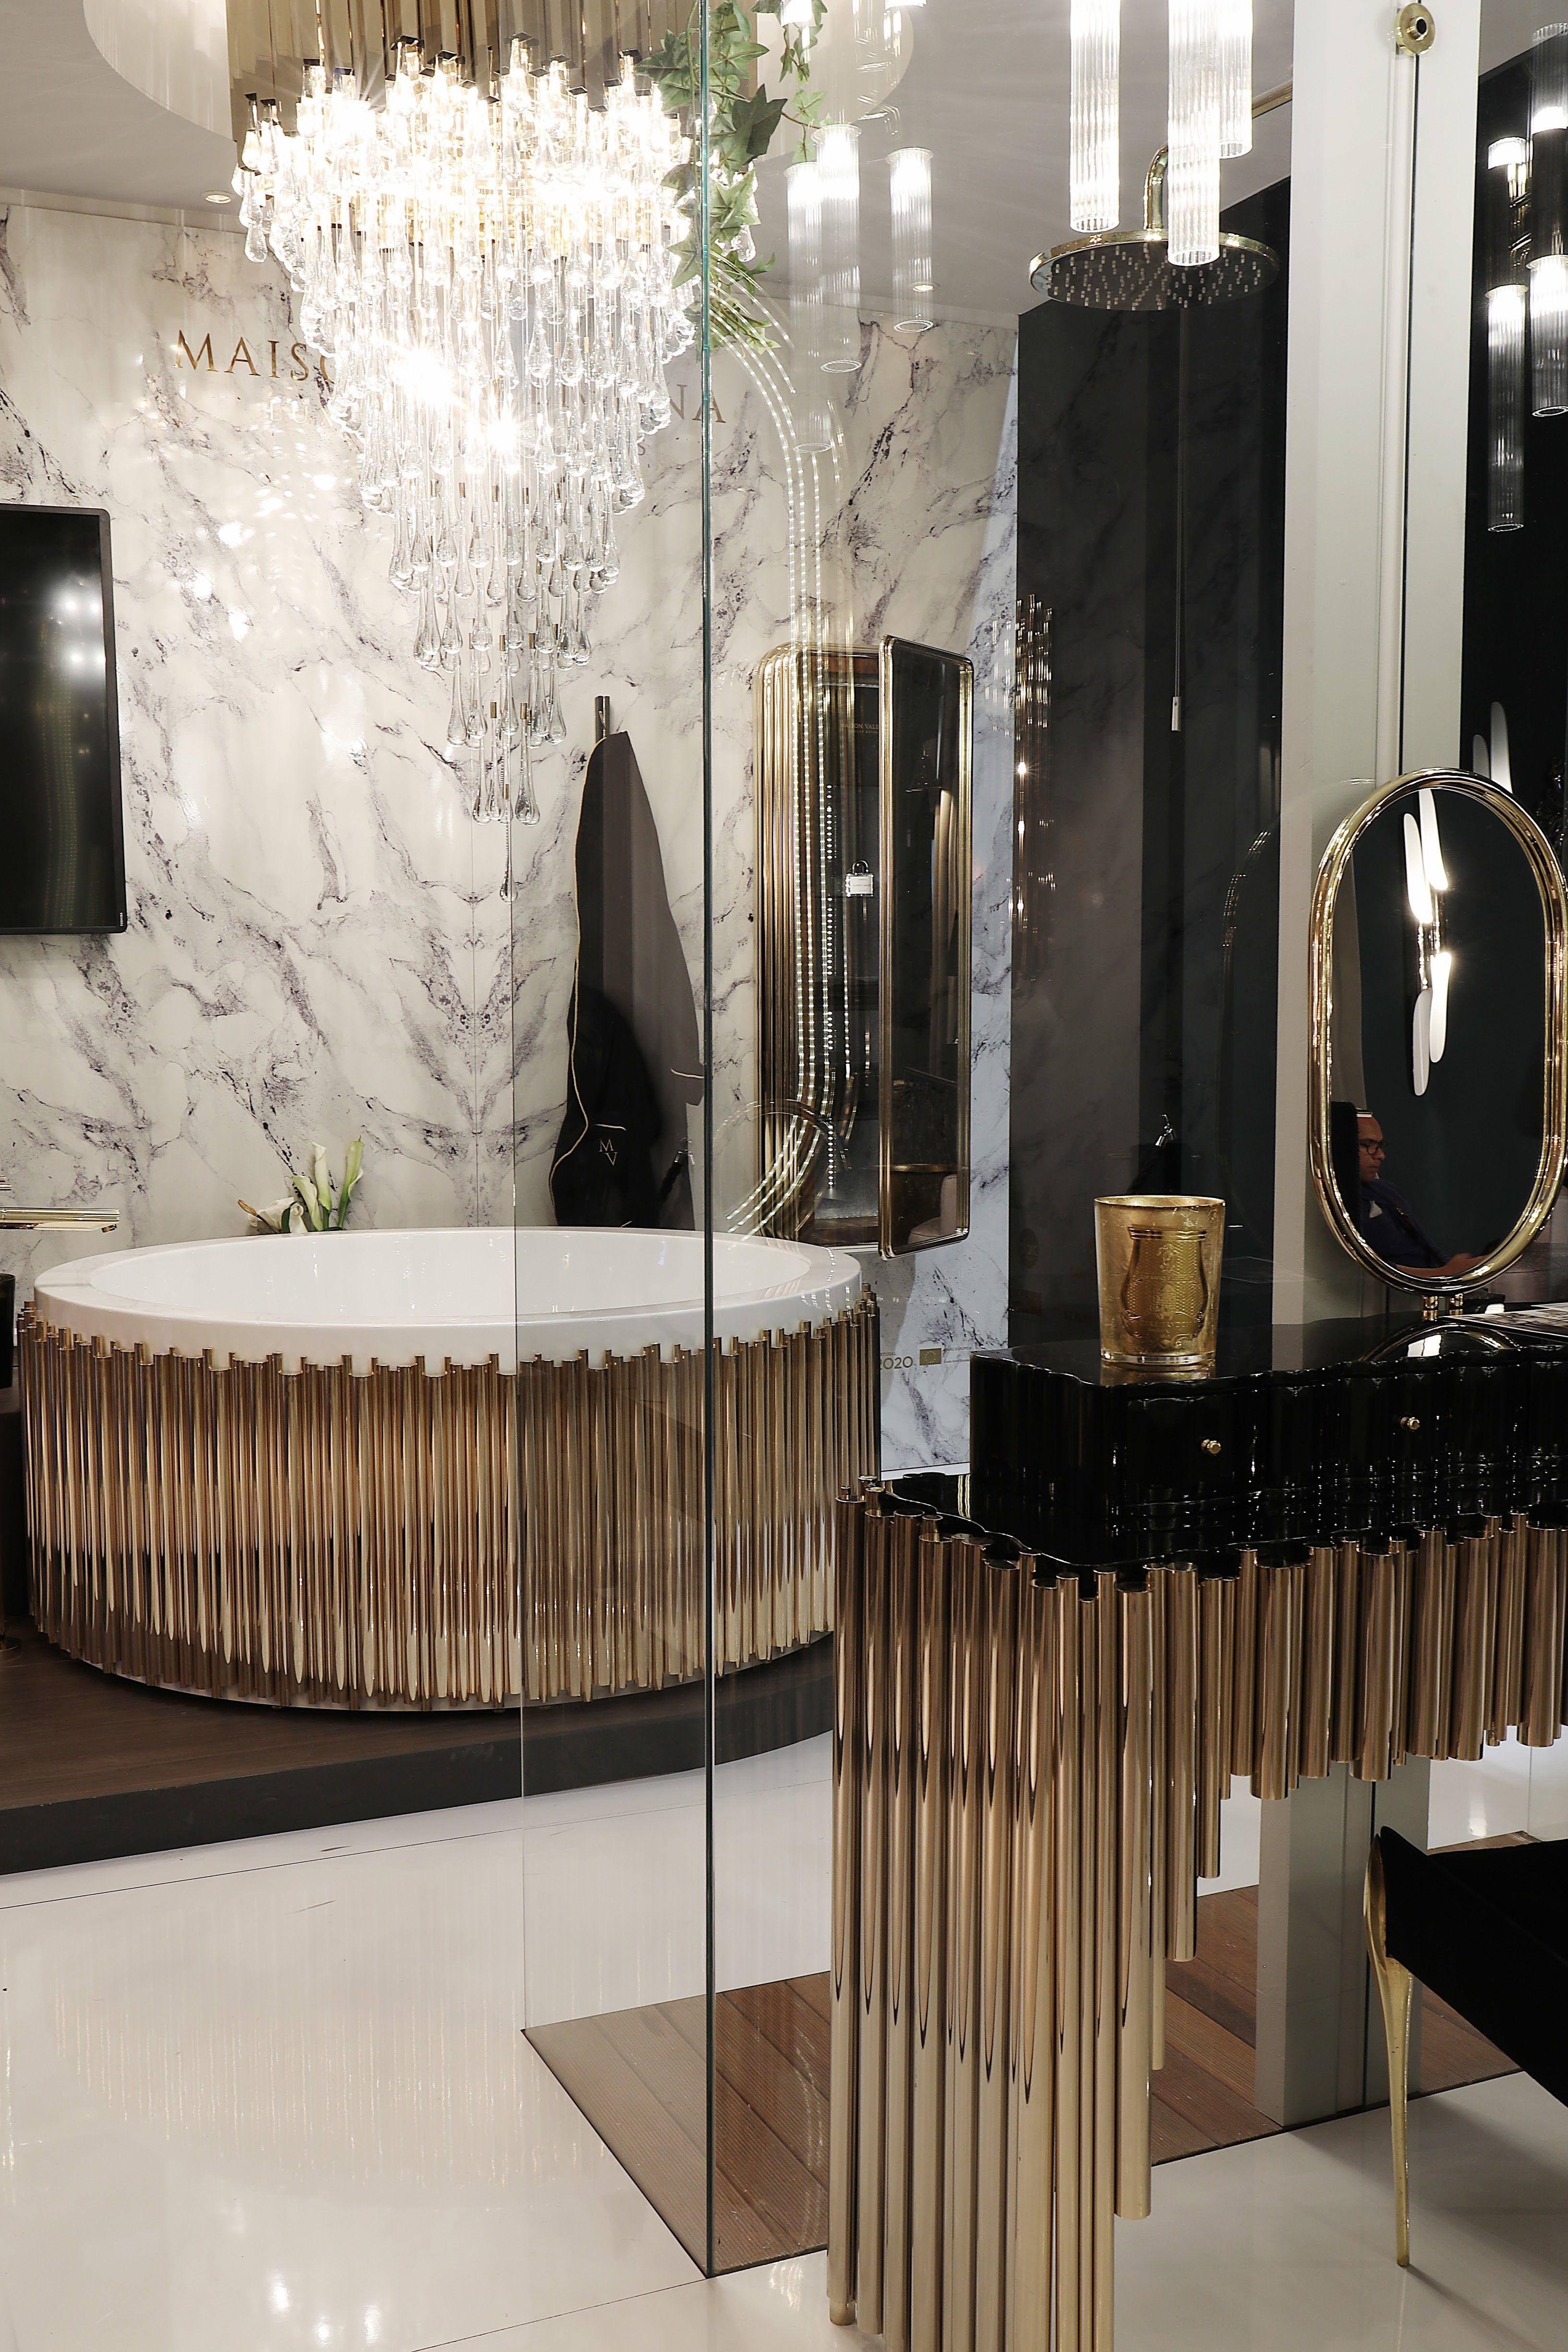 BEST 30 HOME DECORATION DECISIONS FOR 2017 | home decor, interior ...